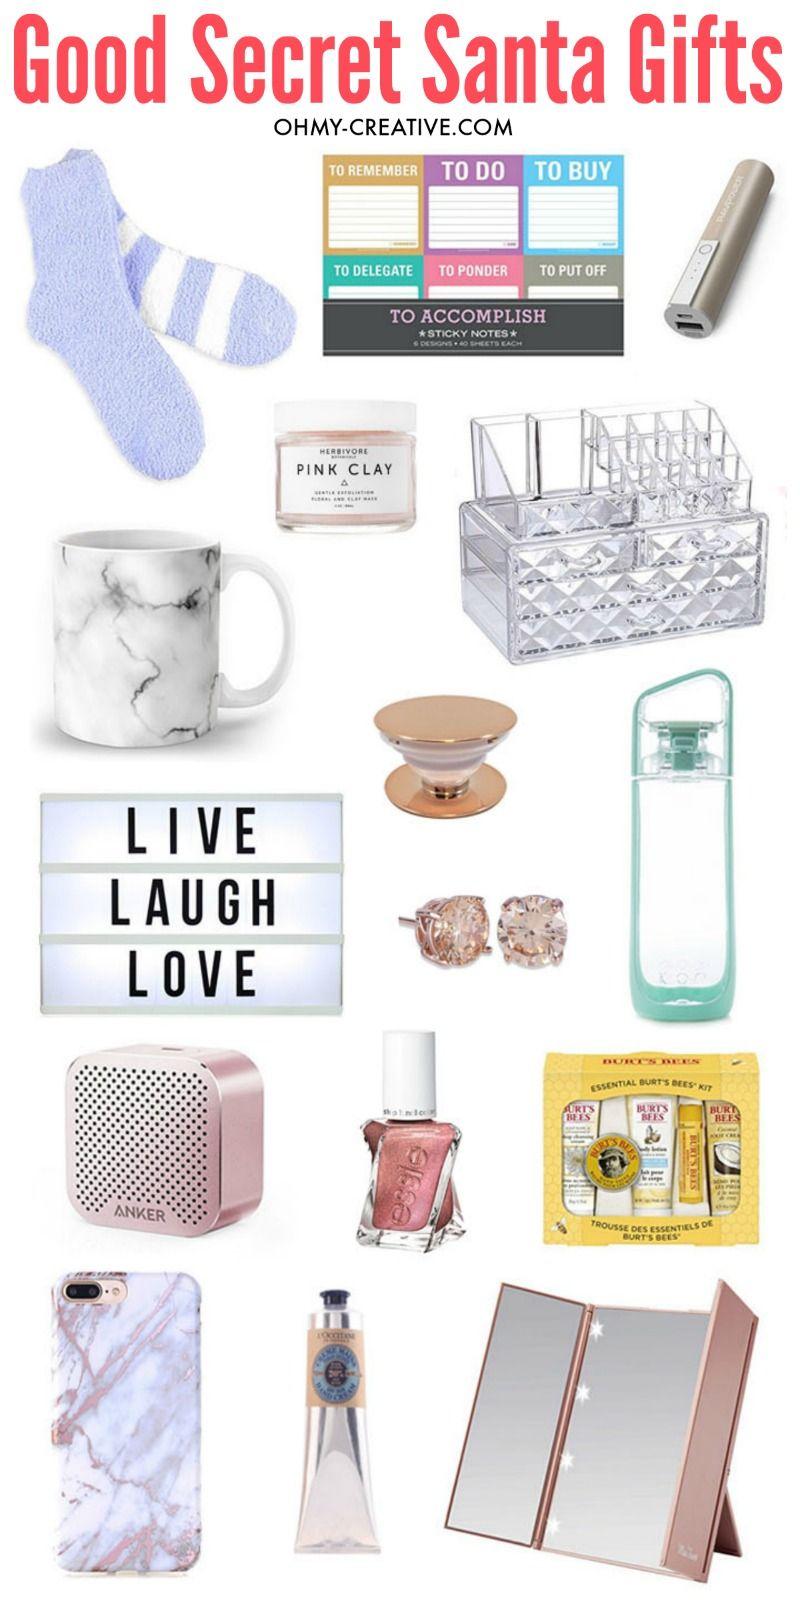 16 Really Good Secret Santa Gifts - Oh My Creative